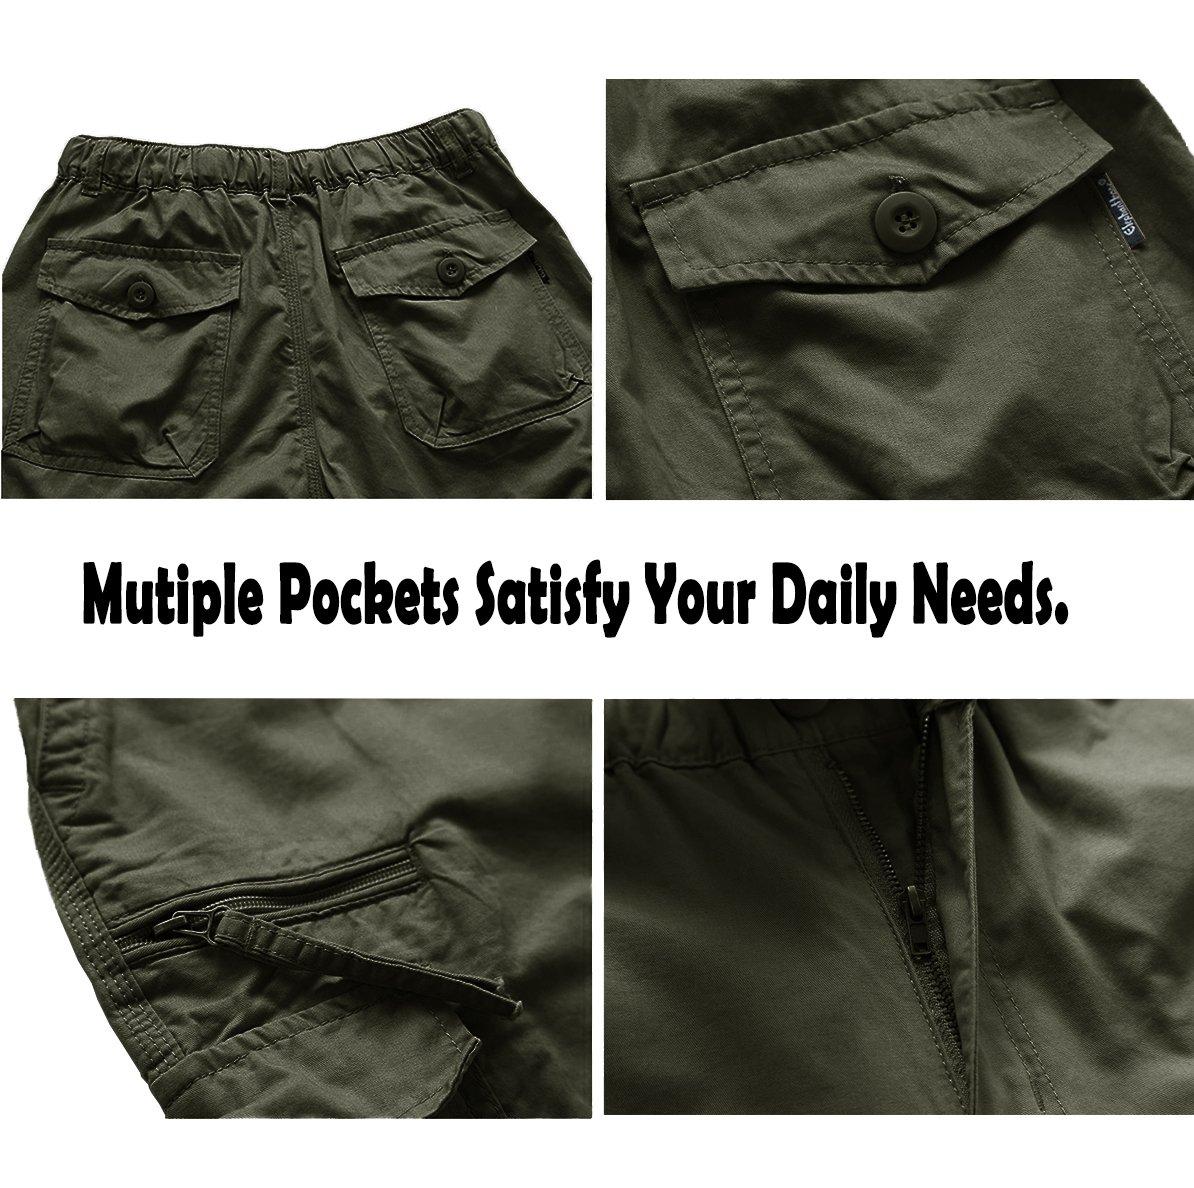 MAKEIIT Men's Juniors Cargo Shorts XXXL Cargo Shorts Dri Fit Cargo Shorts with Multi-Pocket by MAKEIIT (Image #7)